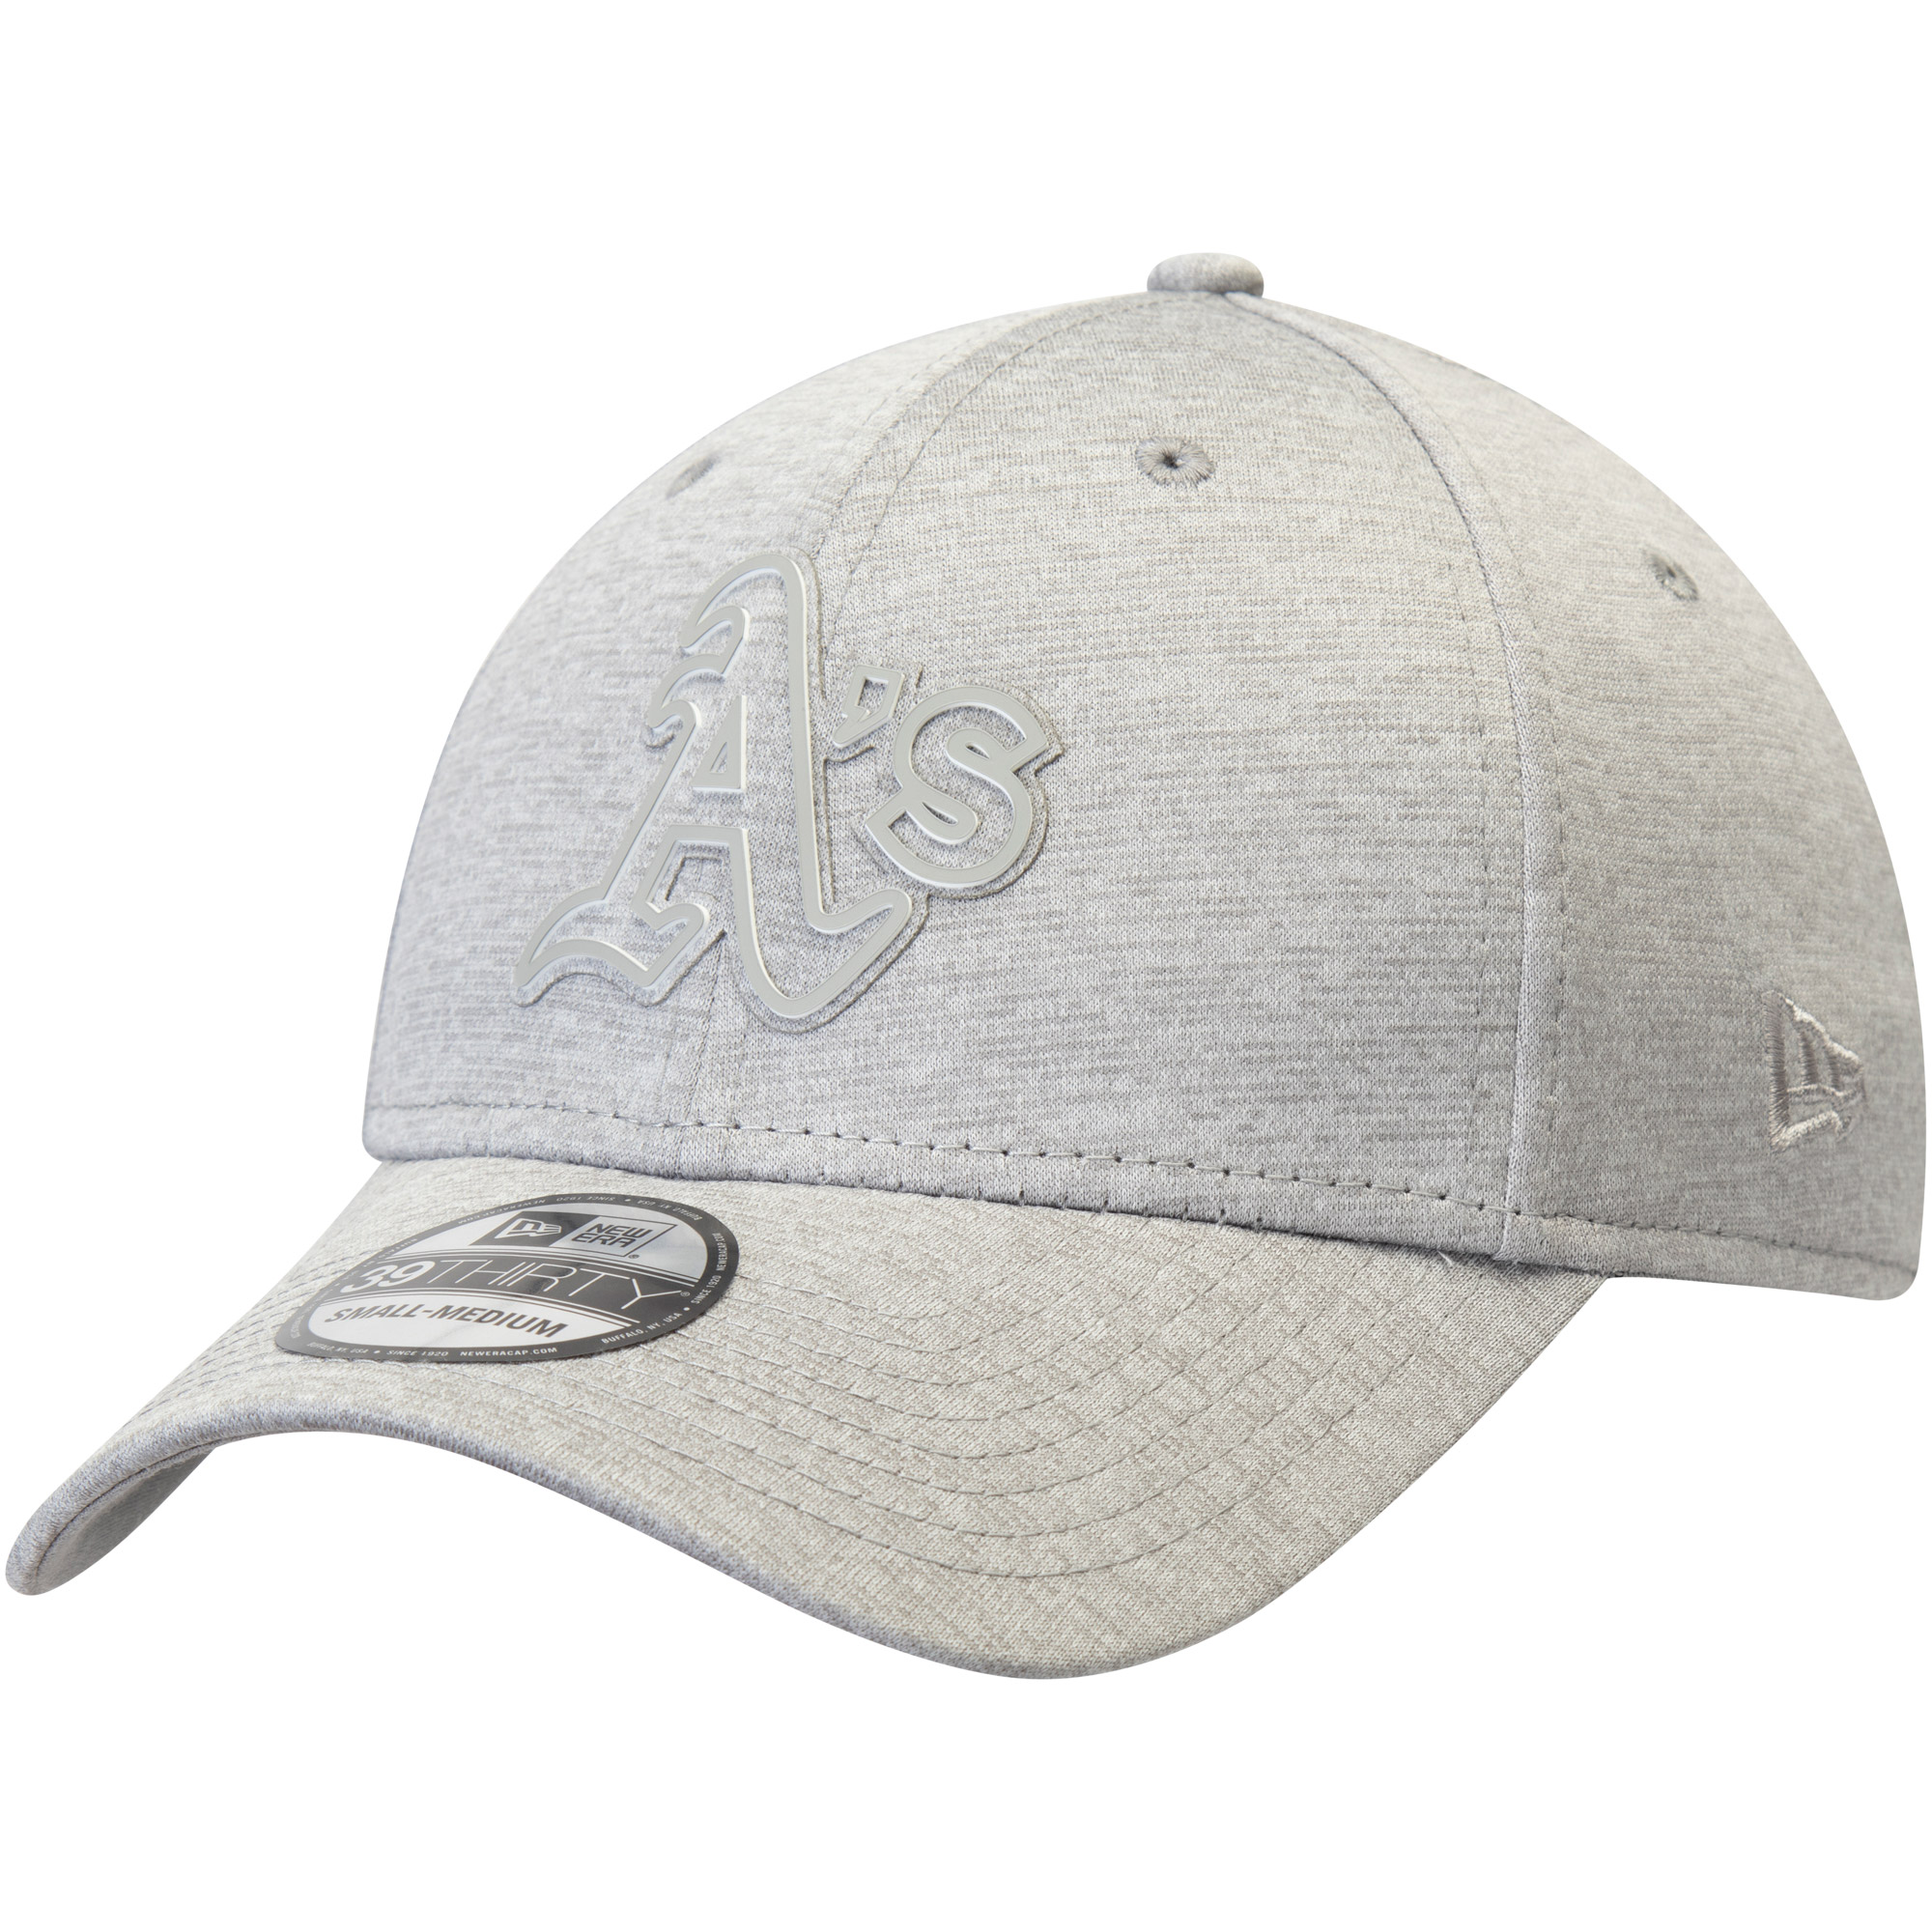 Oakland Athletics New Era Logo Shade 39THIRTY Flex Hat - Gray